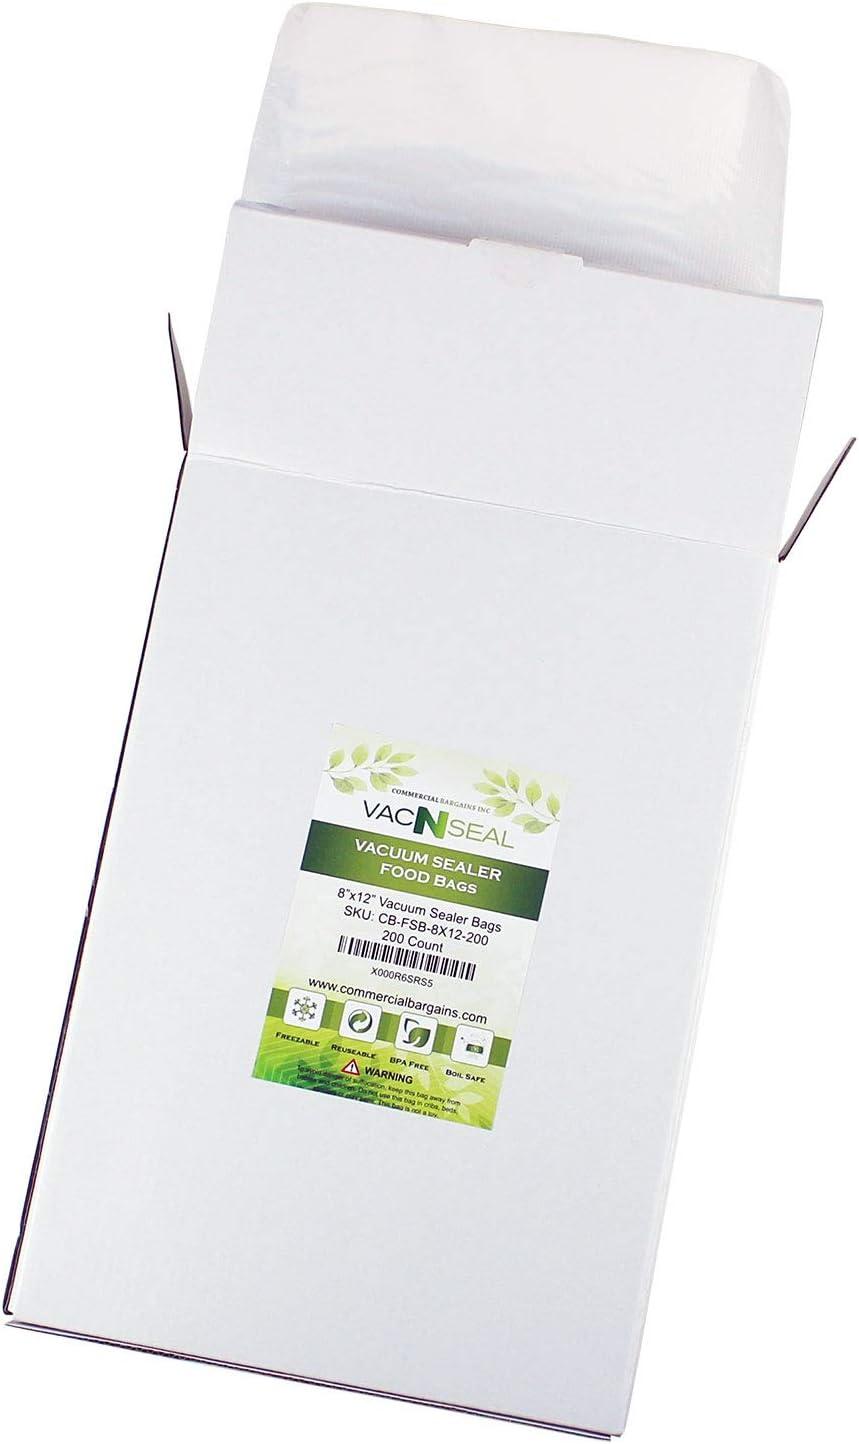 "Commercial Bargains 200 CT 8"" x 12"" Vacuum Food Sealer Storage for FoodSaver Freezer Bags Quart Size Sous Vide"